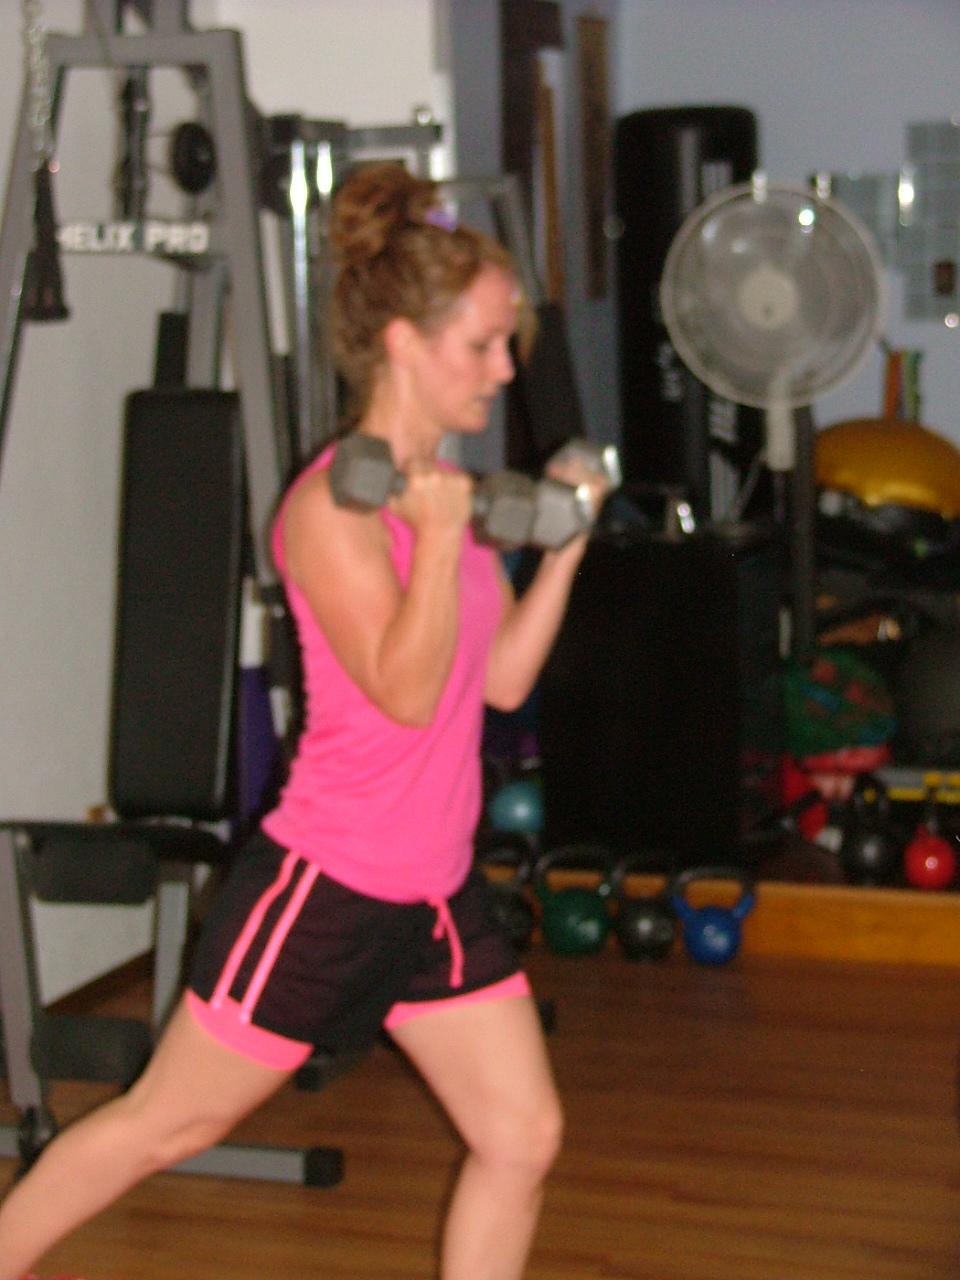 2 X Fitness - health  | Photo 8 of 8 | Address: 1503 N 26th St, Mesa, AZ 85213, USA | Phone: (480) 406-1570